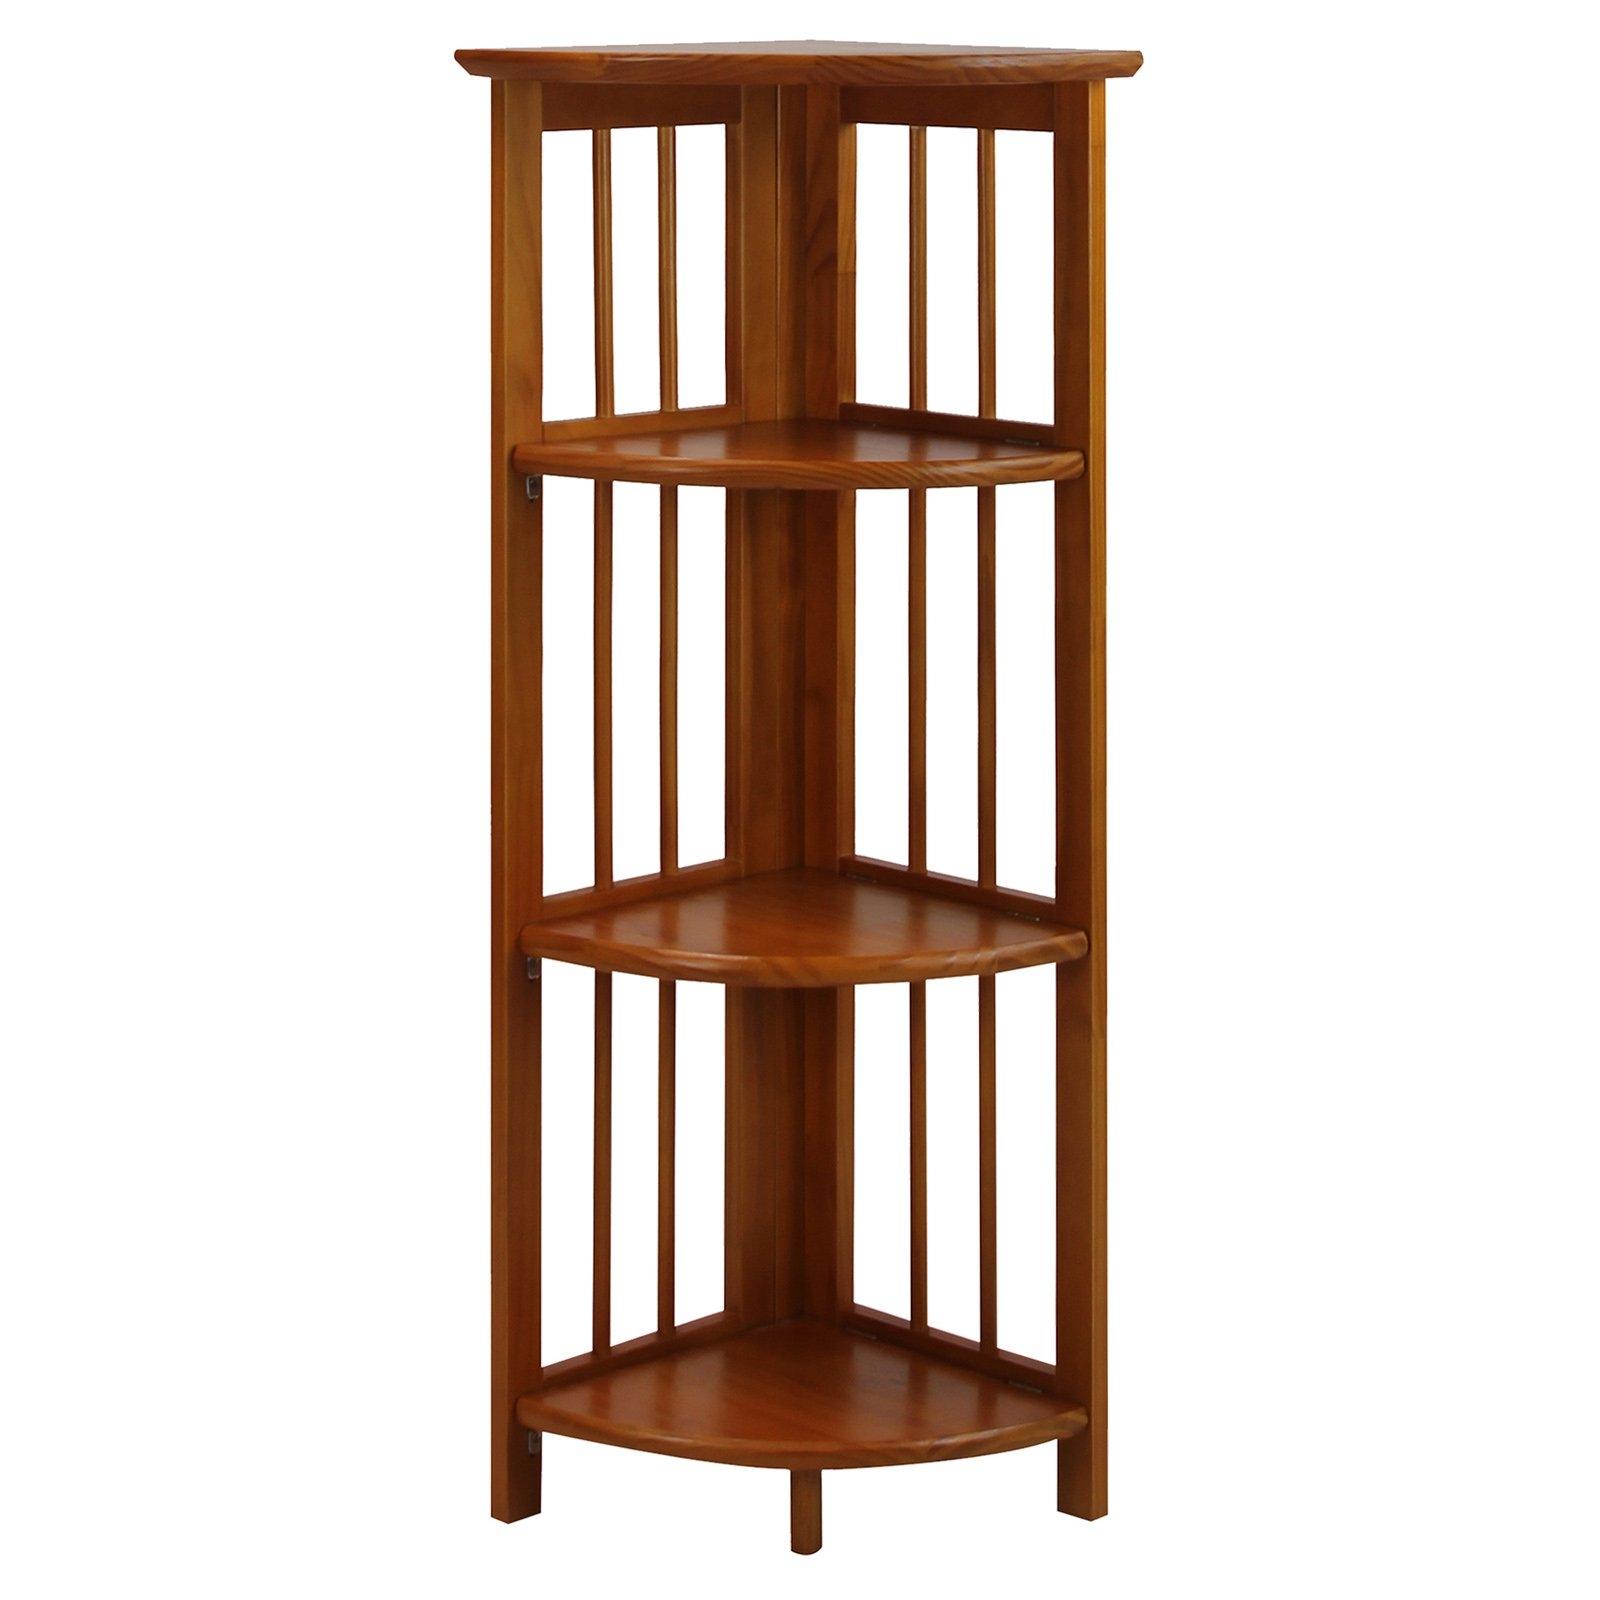 Inspiration about 4 Tier Corner Folding Bookcase Honey Oak Bookcases At Hayneedle In Corner Oak Bookcase (#8 of 15)